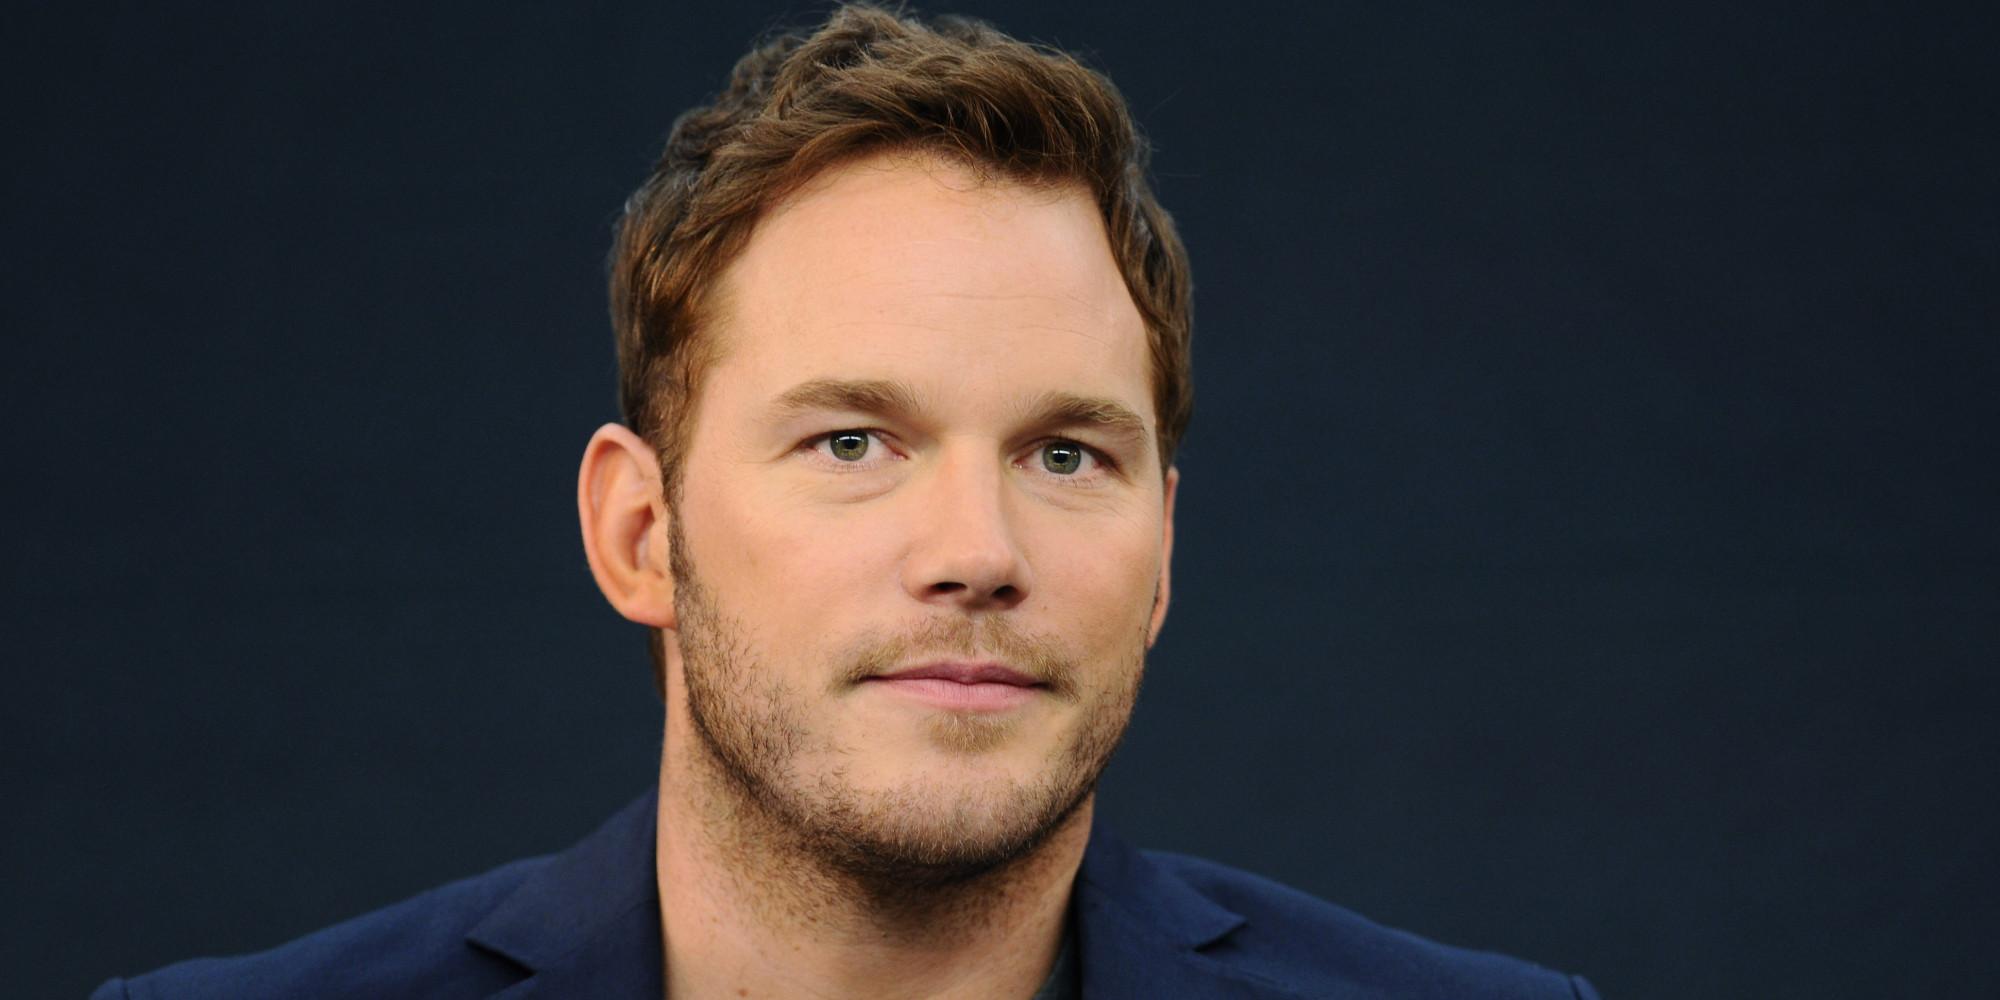 Disney Wants Chris Pratt for New Indiana Jones